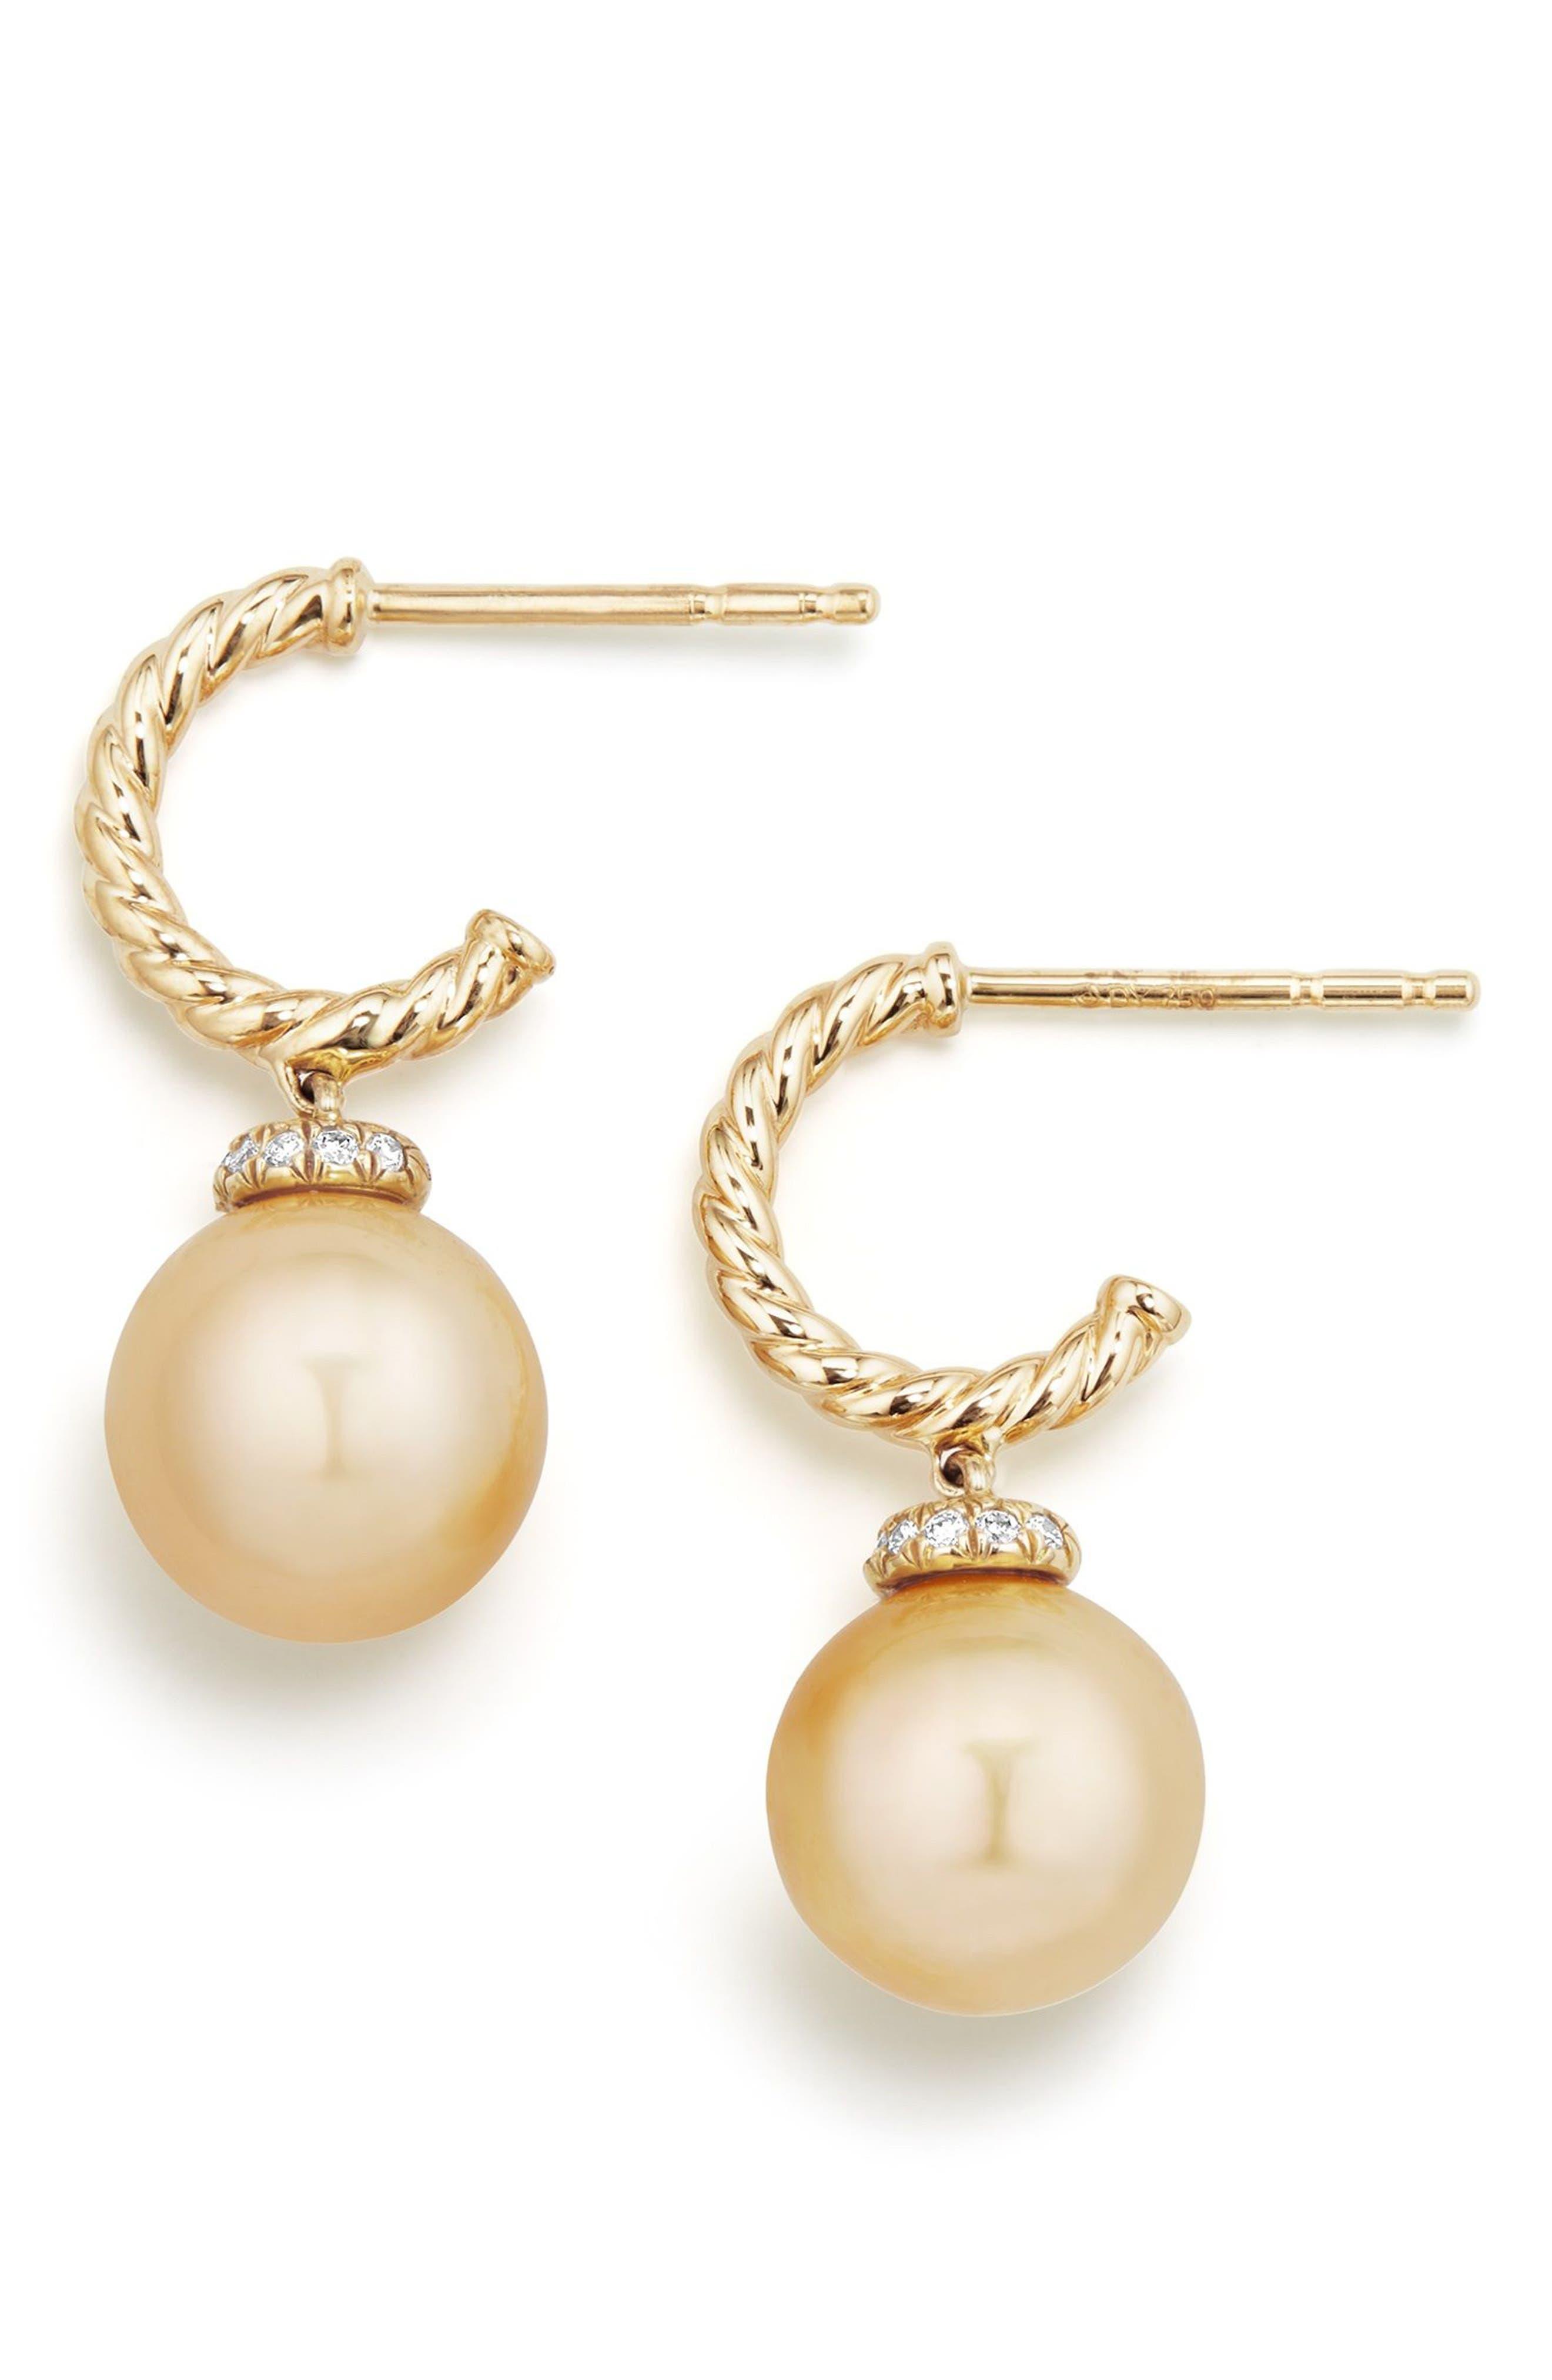 Solari Hoop Earrings with Diamonds and Genuine Pearl,                             Alternate thumbnail 2, color,                             Gold/ Diamond/ Yellow Pearl